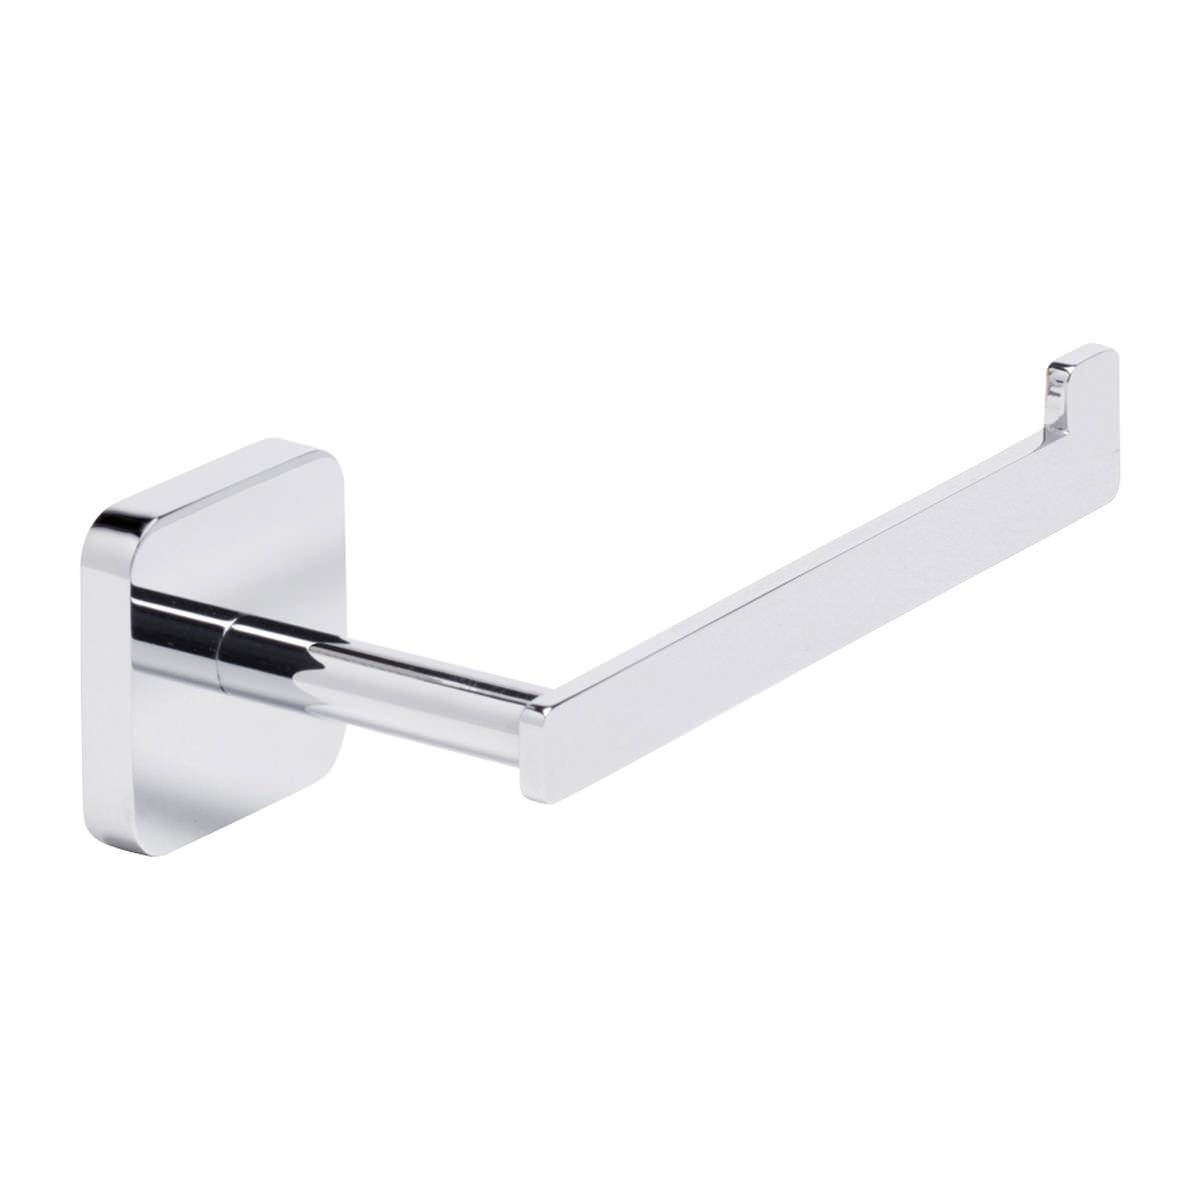 Roper Rhodes Ignite Chrome Finish Toilet Roll Holder | 8518.02